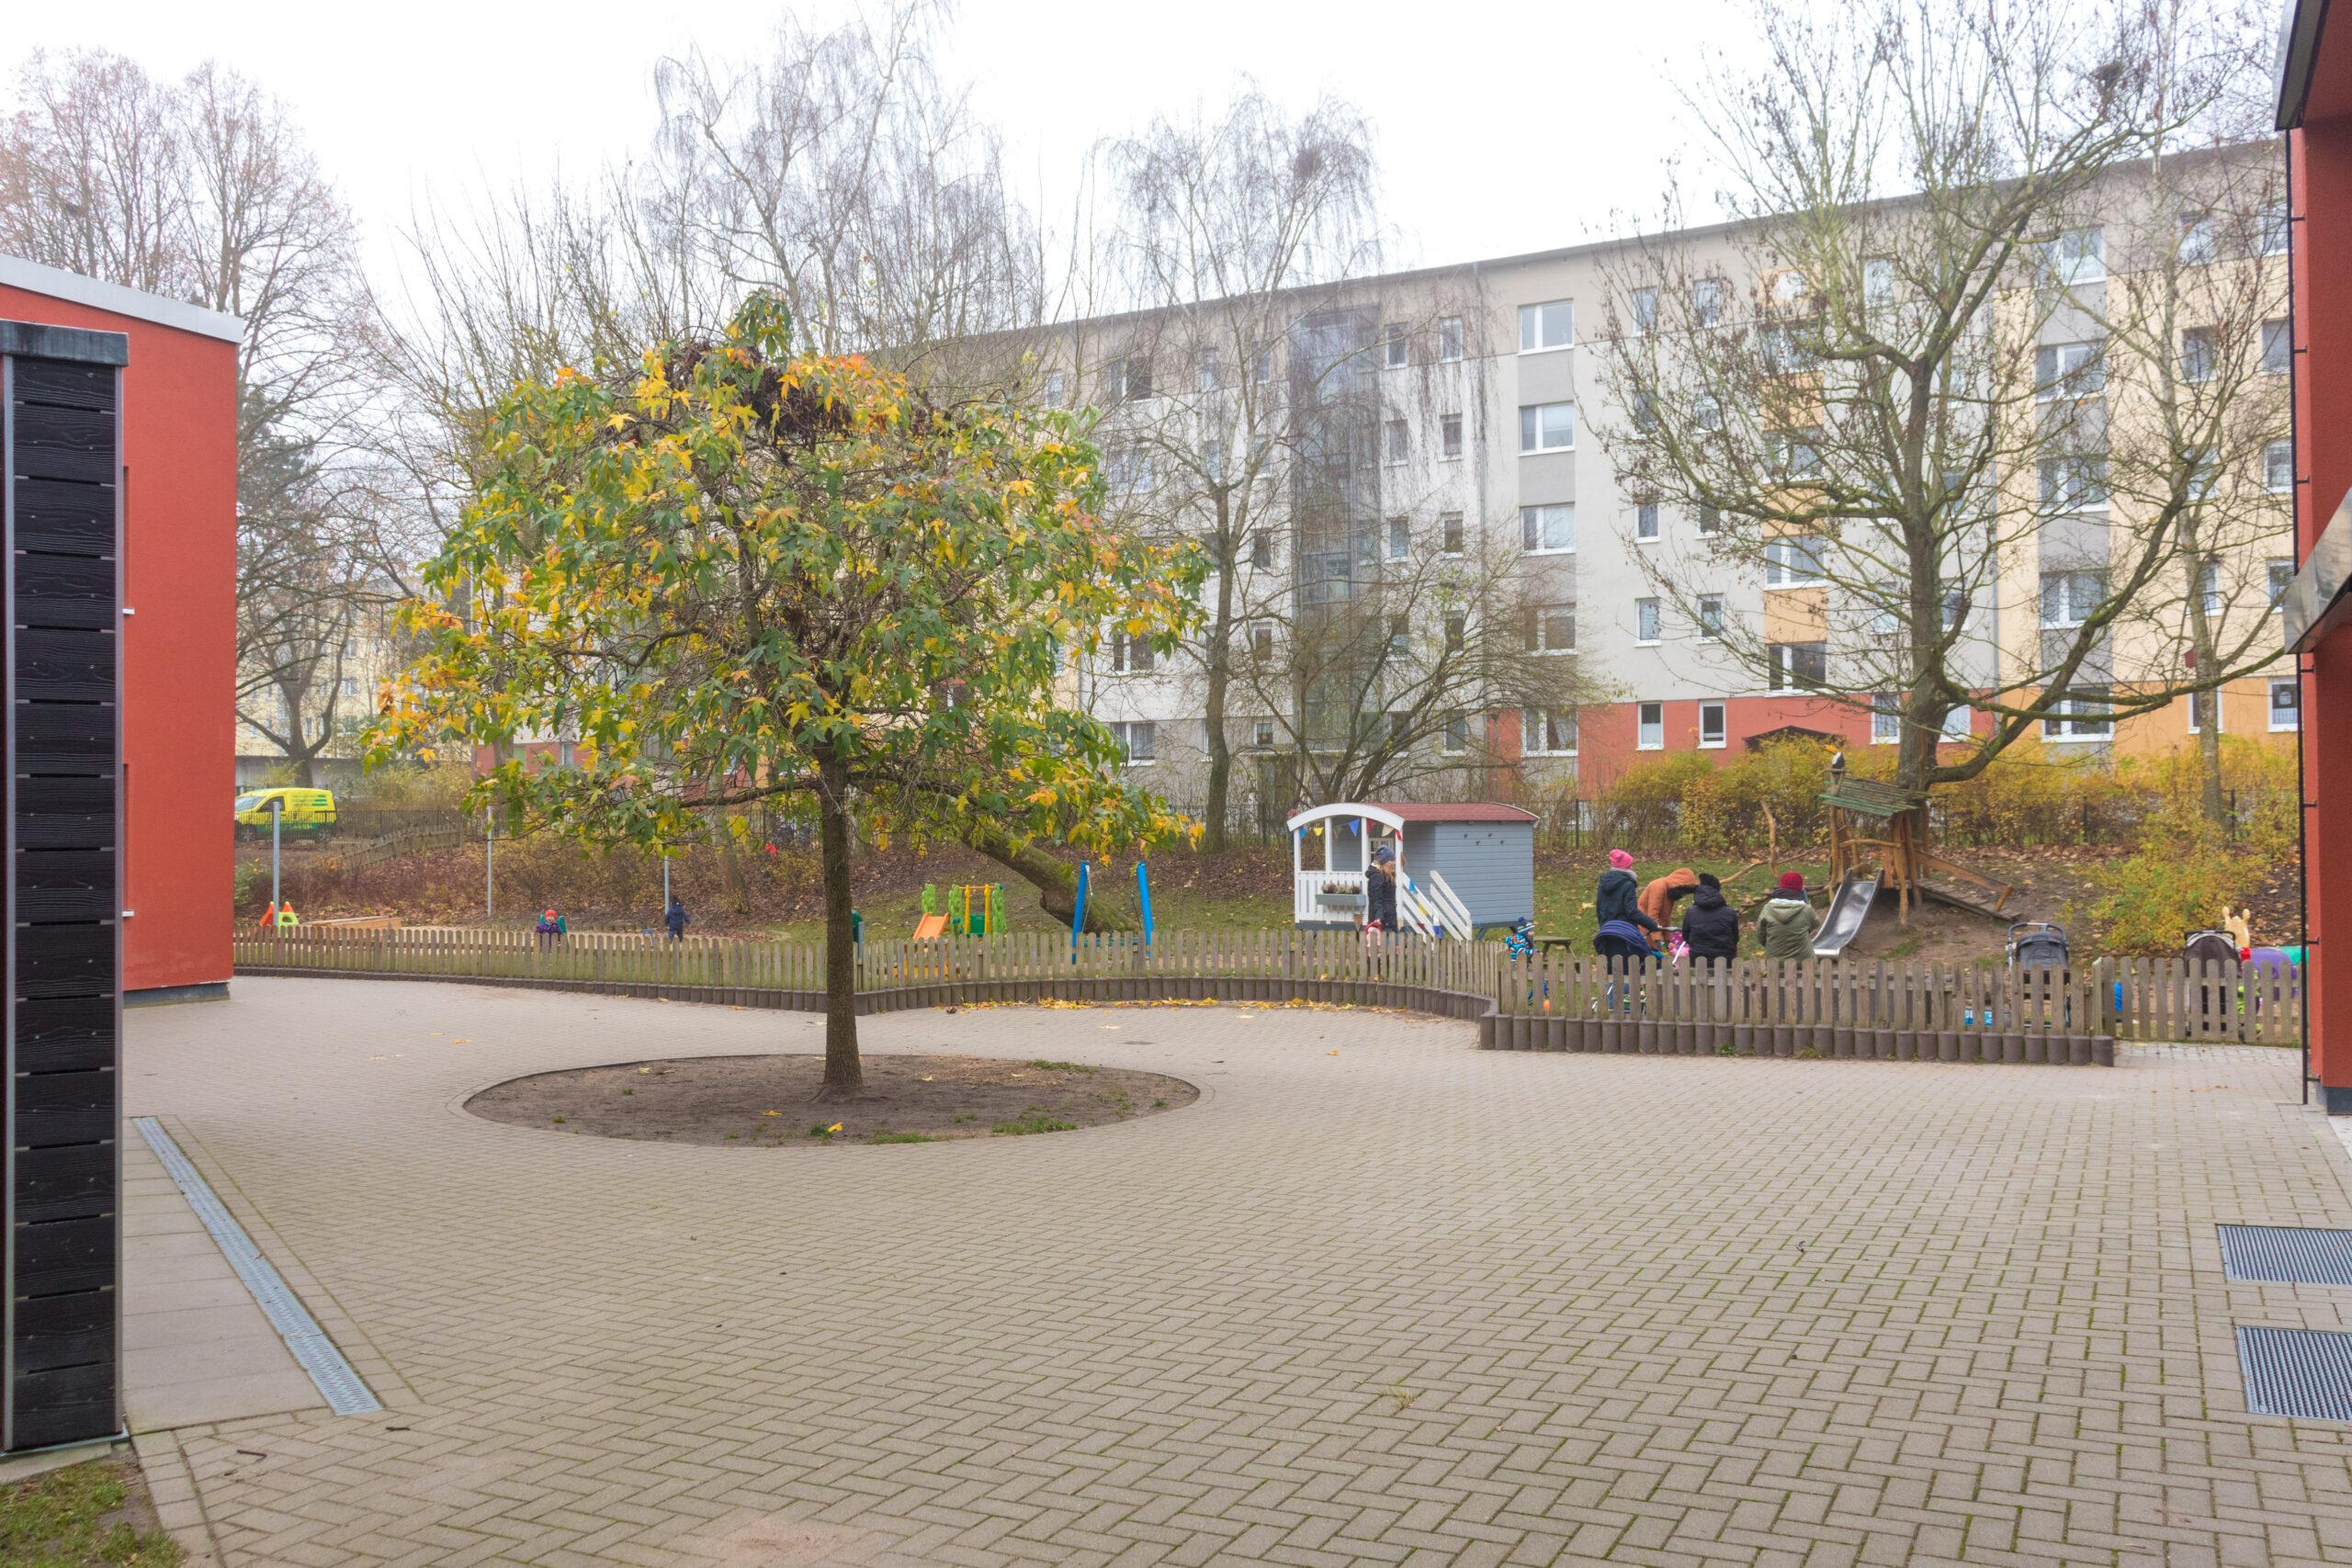 Kita Rappelkiste Rostock